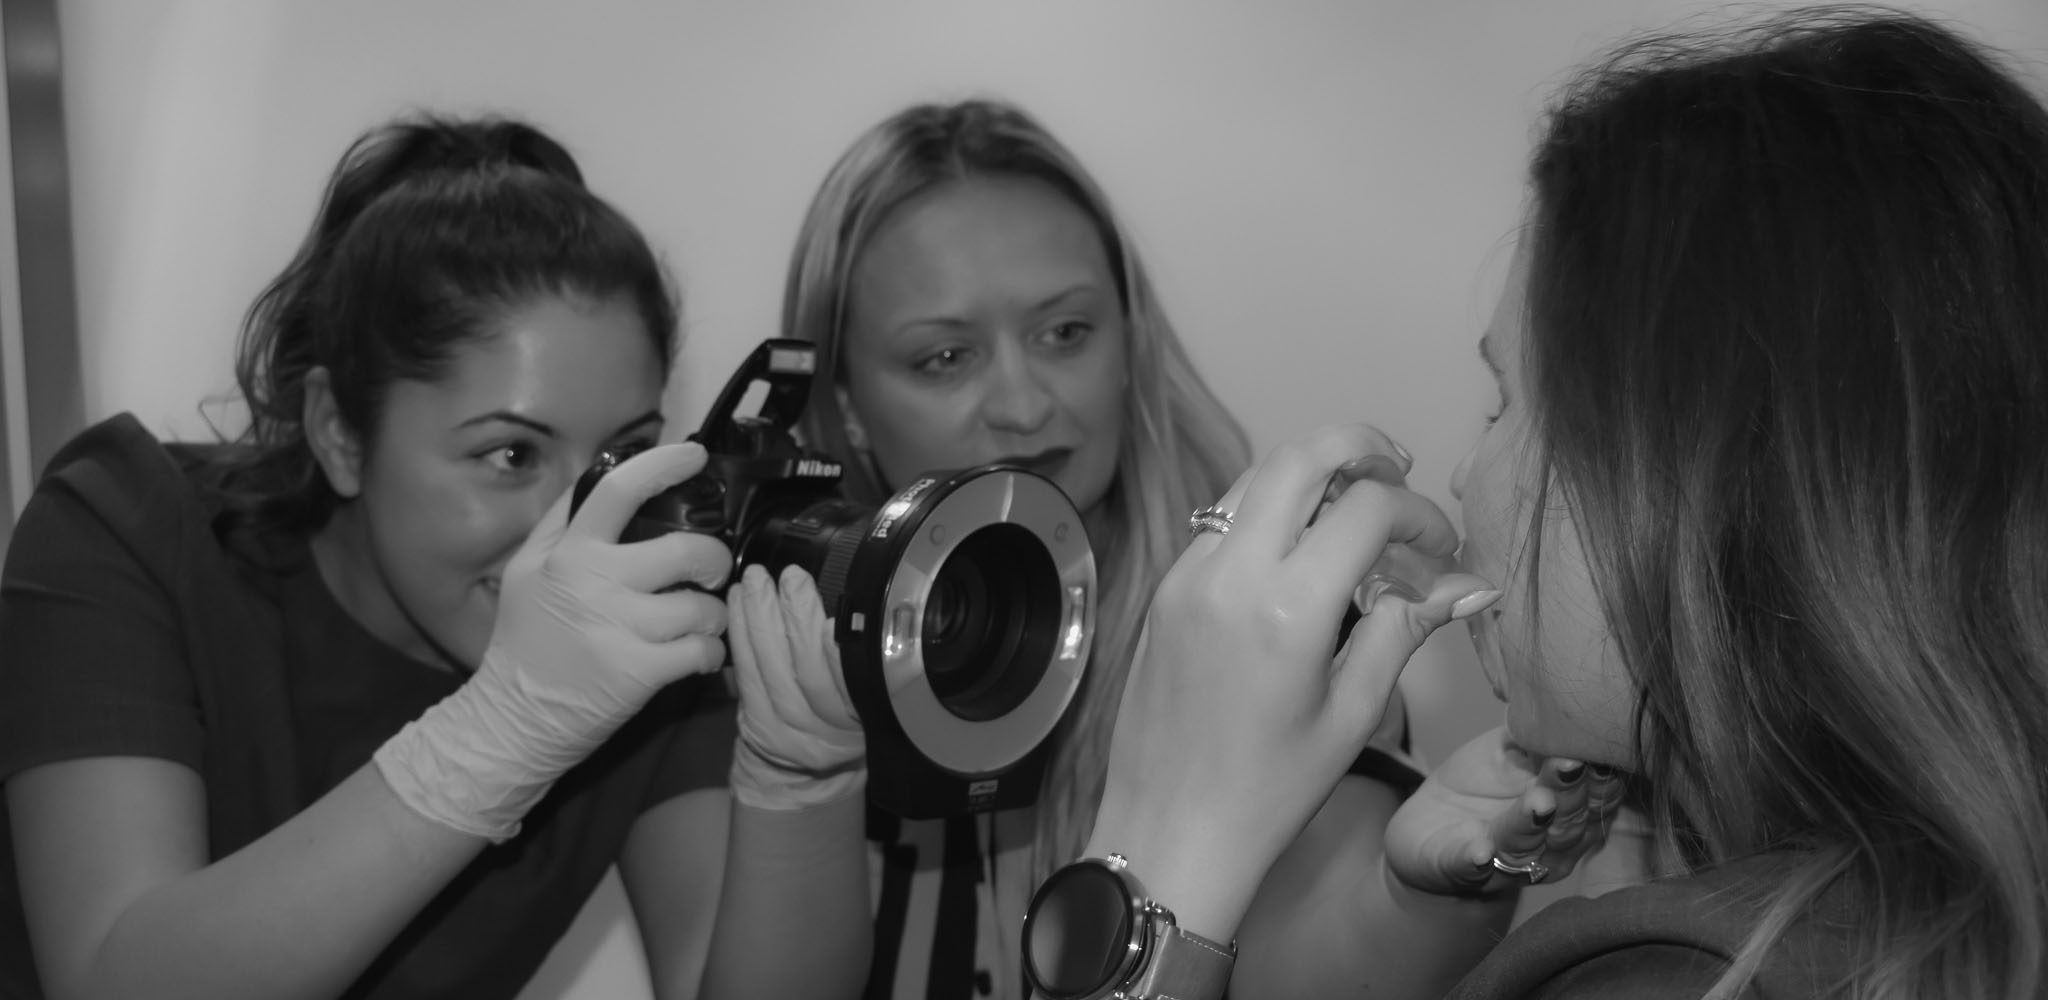 focusphotography 7 2048x1000